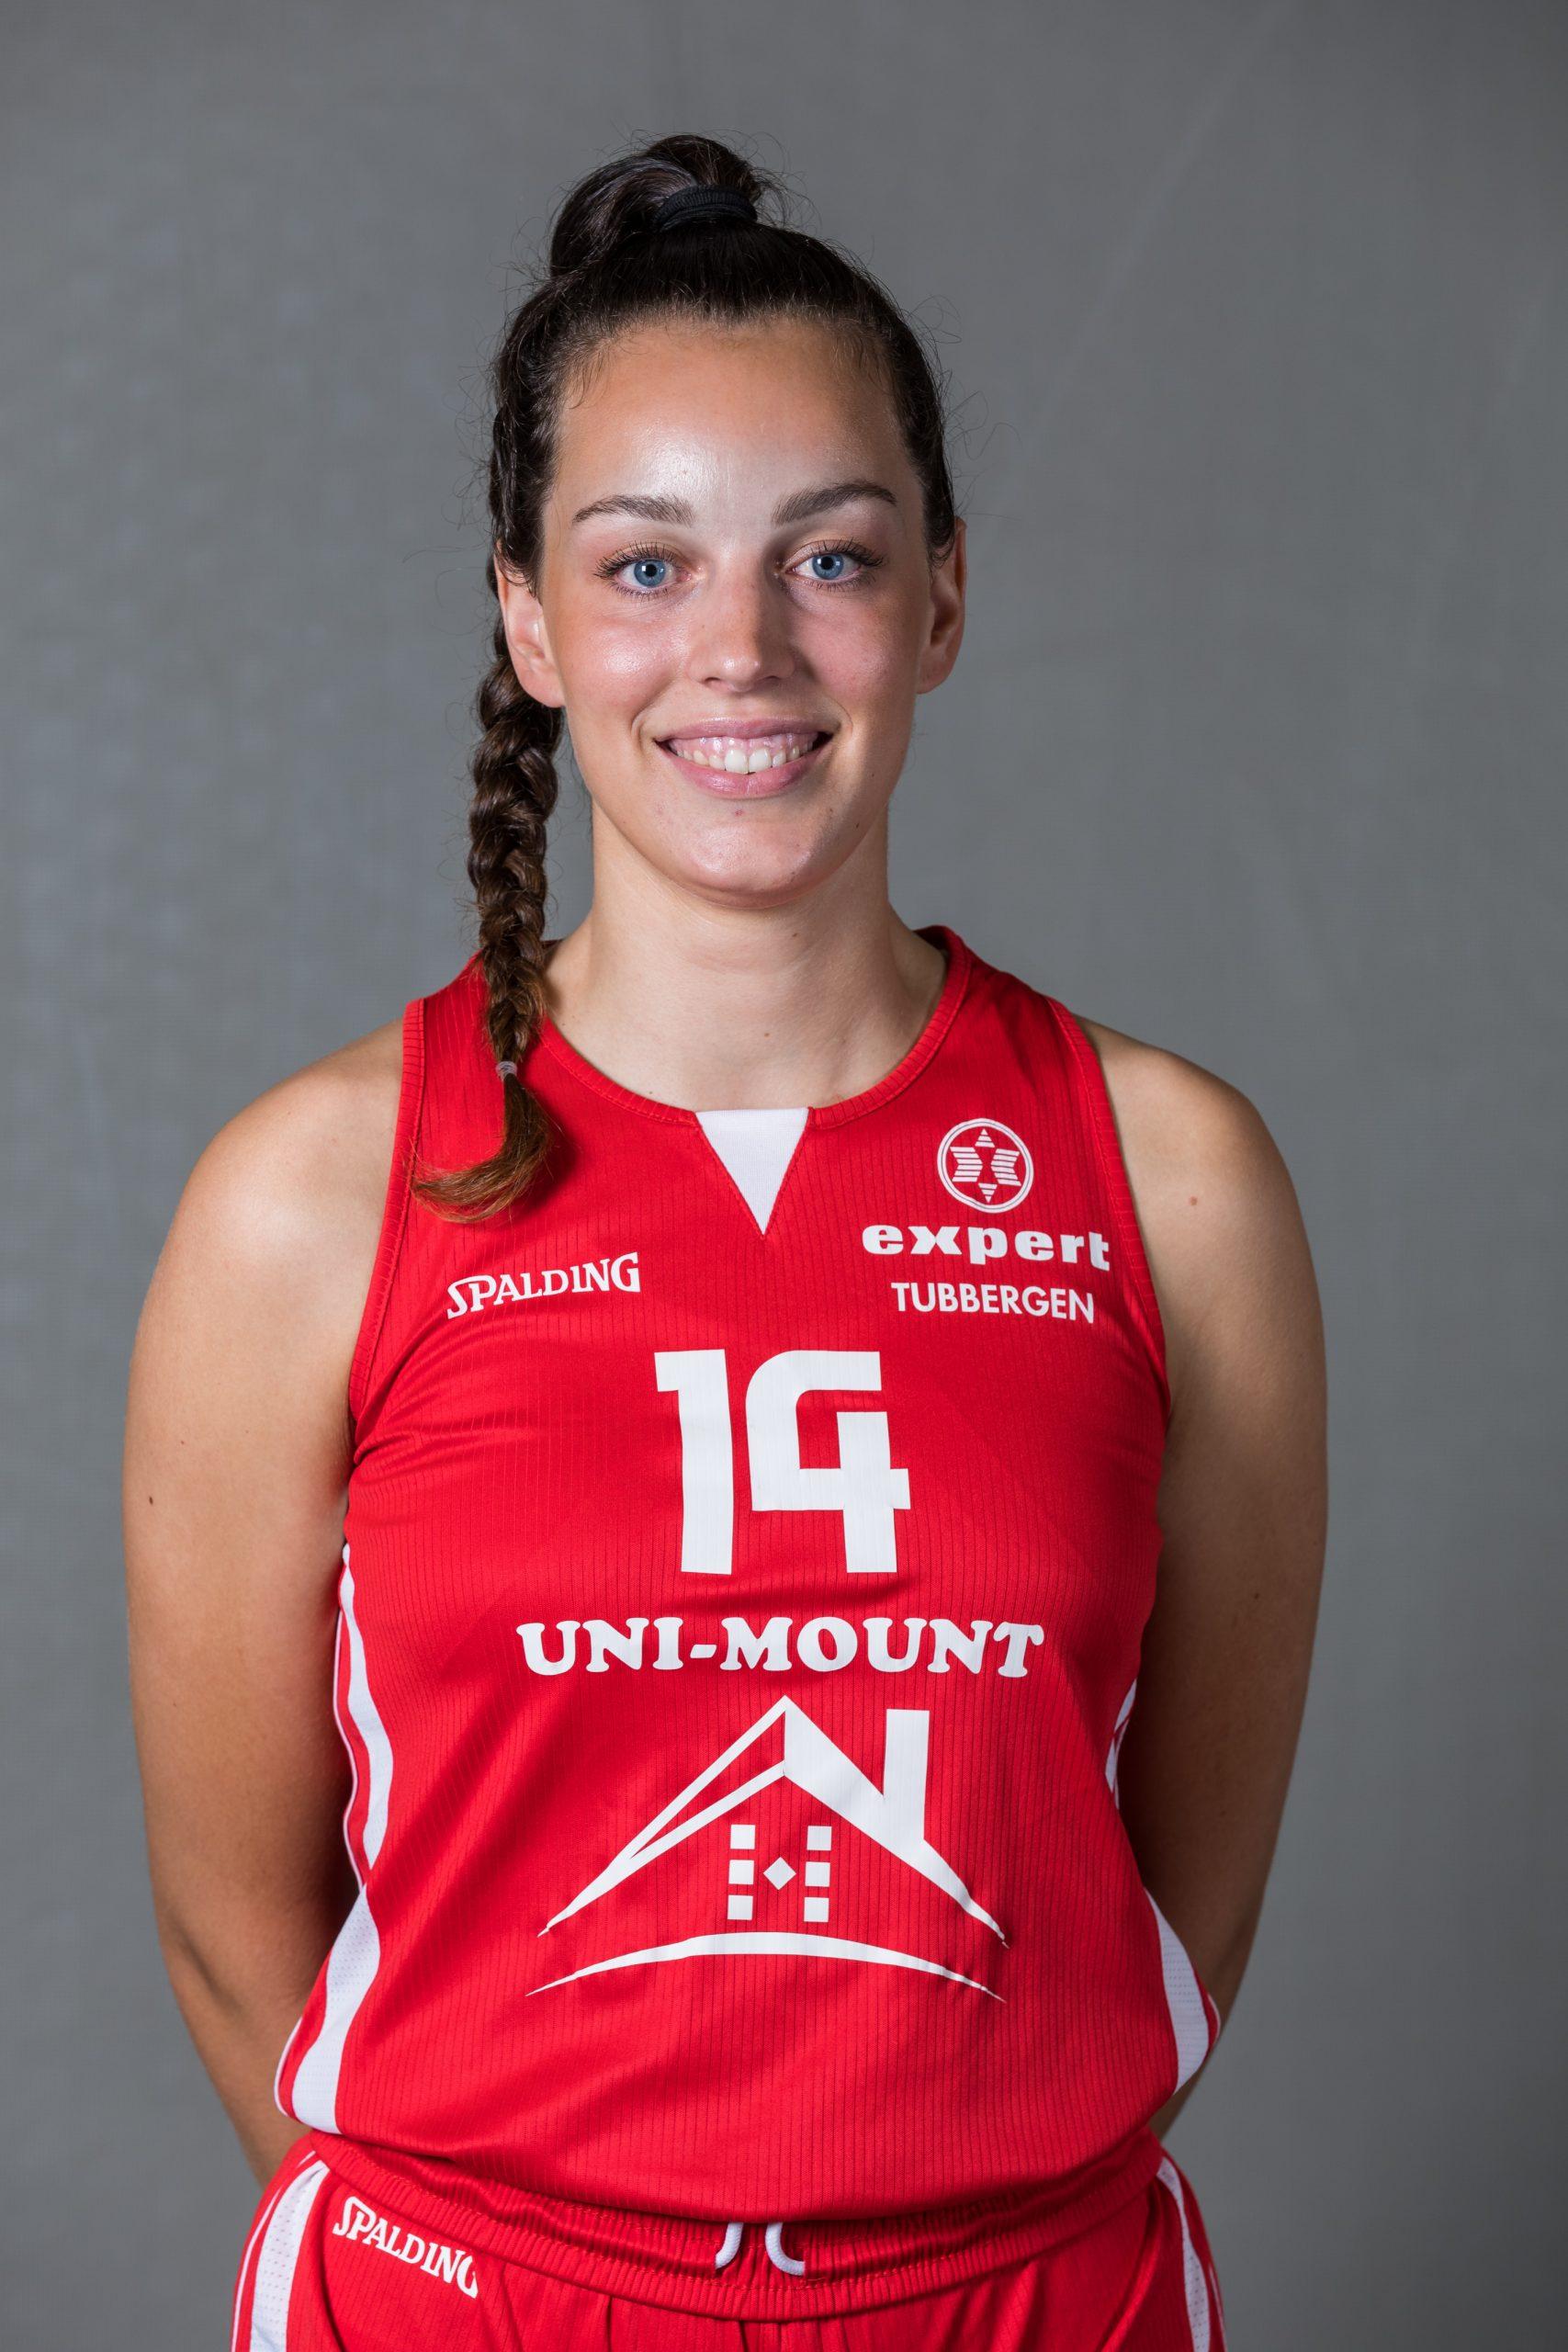 14. Laura Steggink